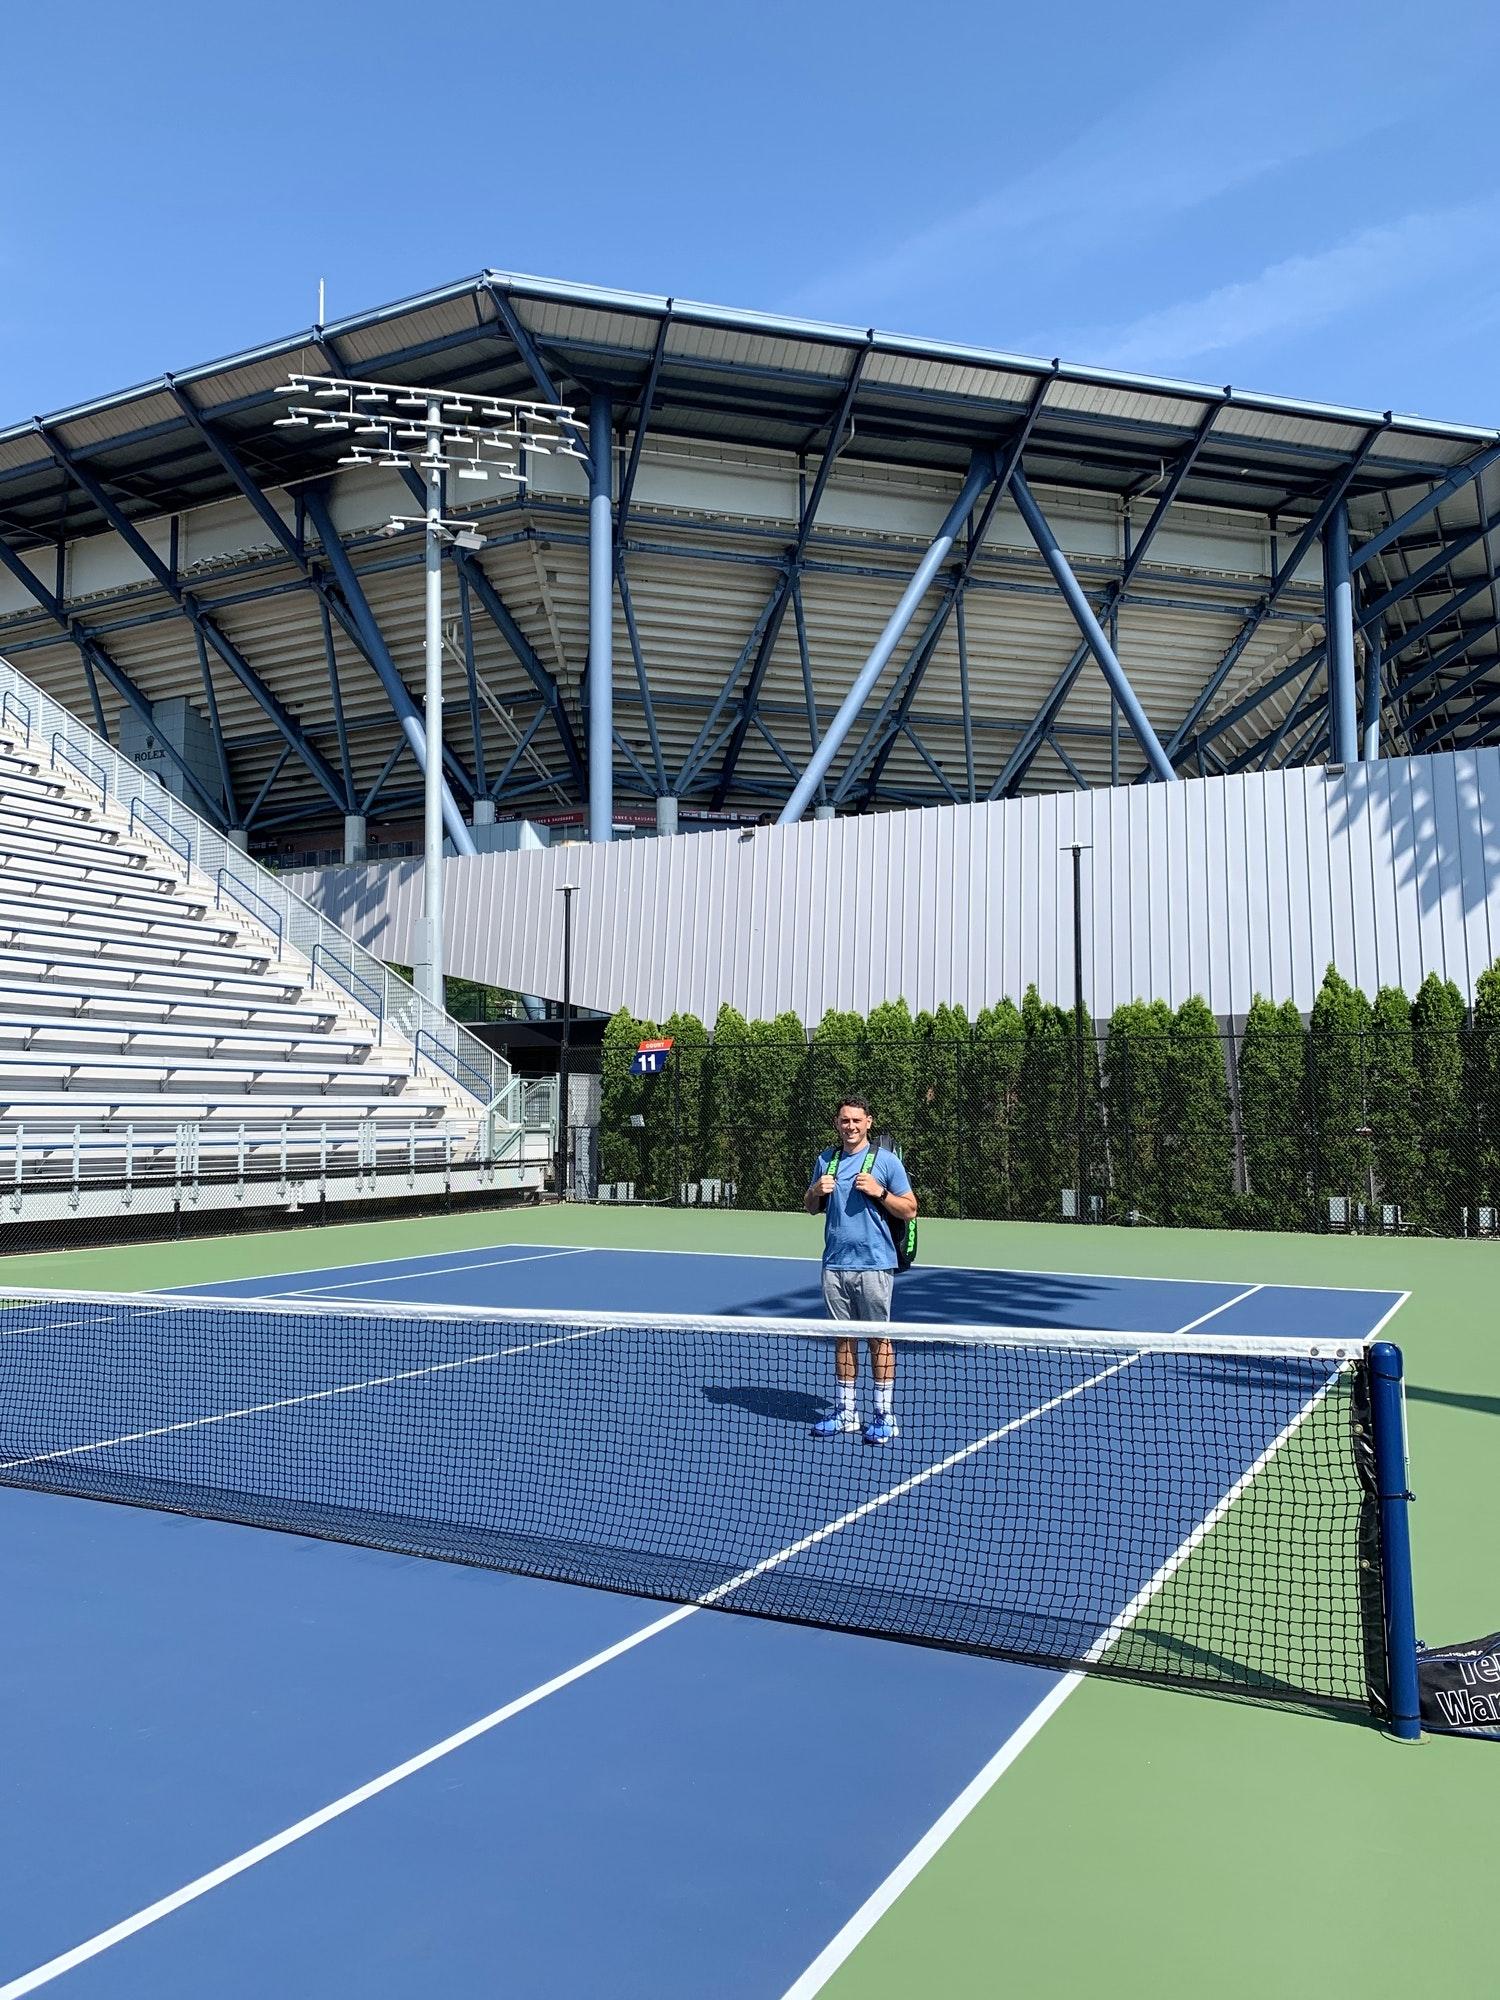 Josh D. teaches tennis lessons in Massapequa Park, NY